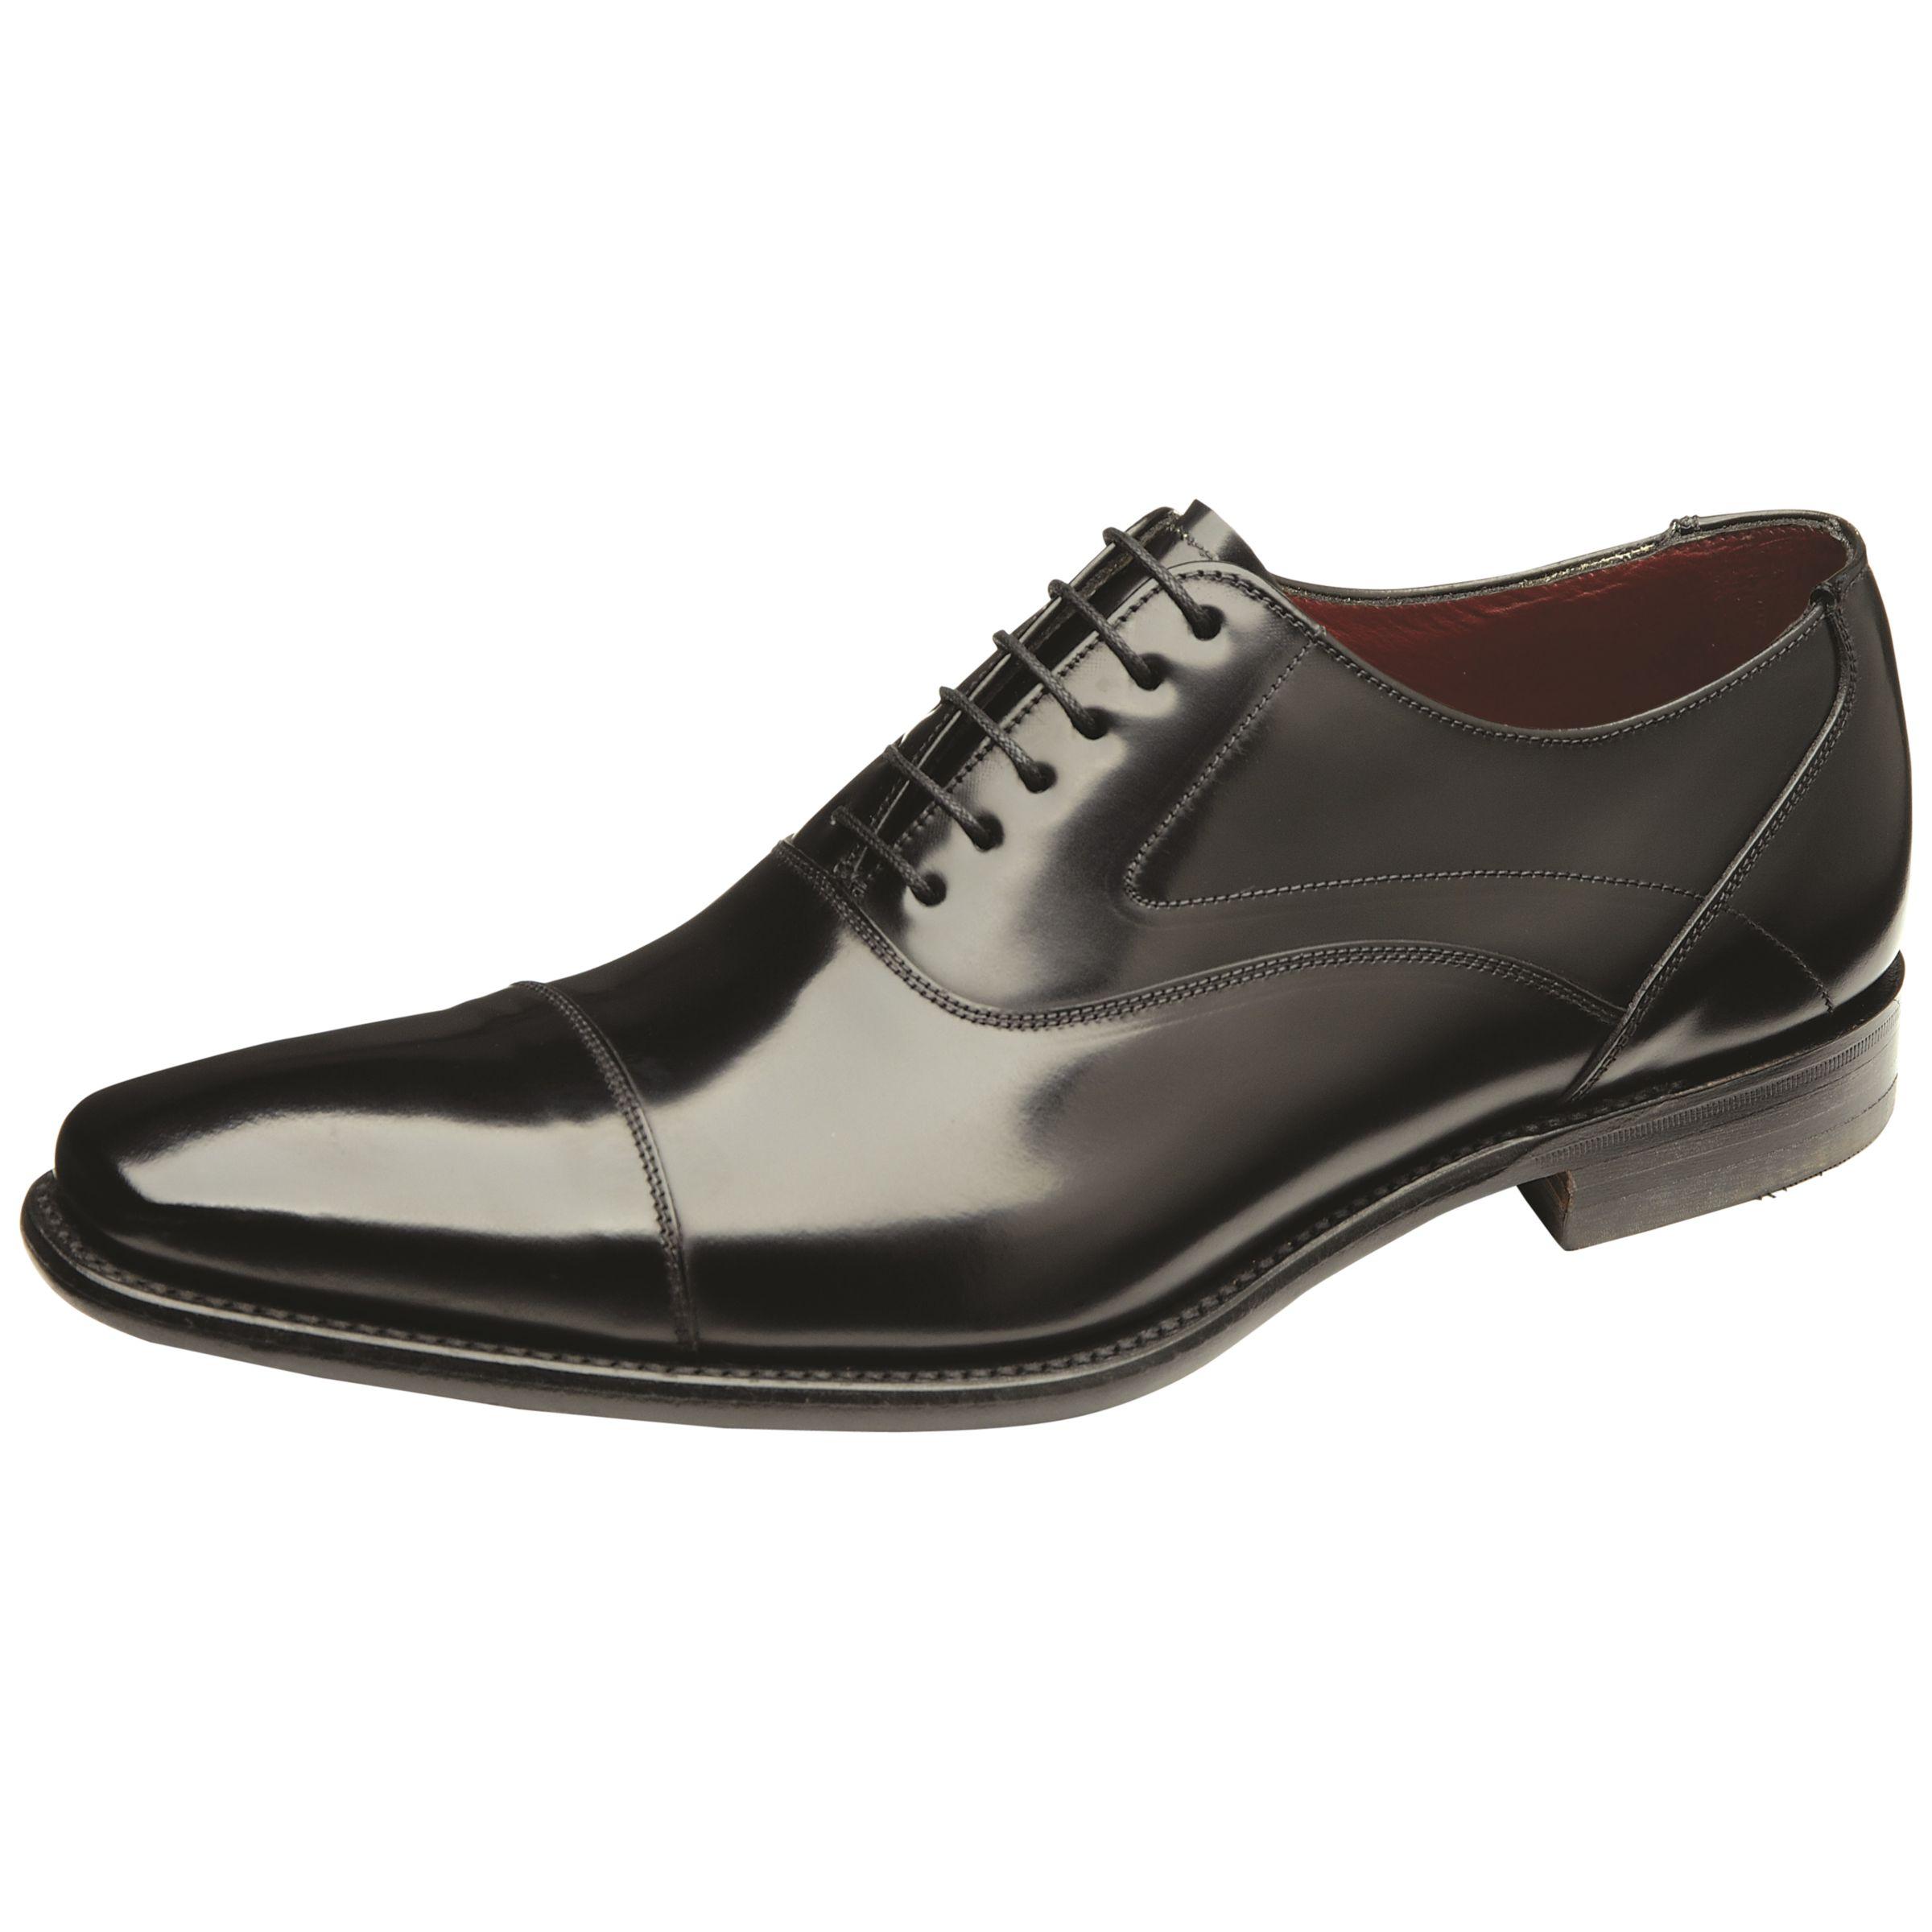 Loake Loake Sharp Leather Shoes